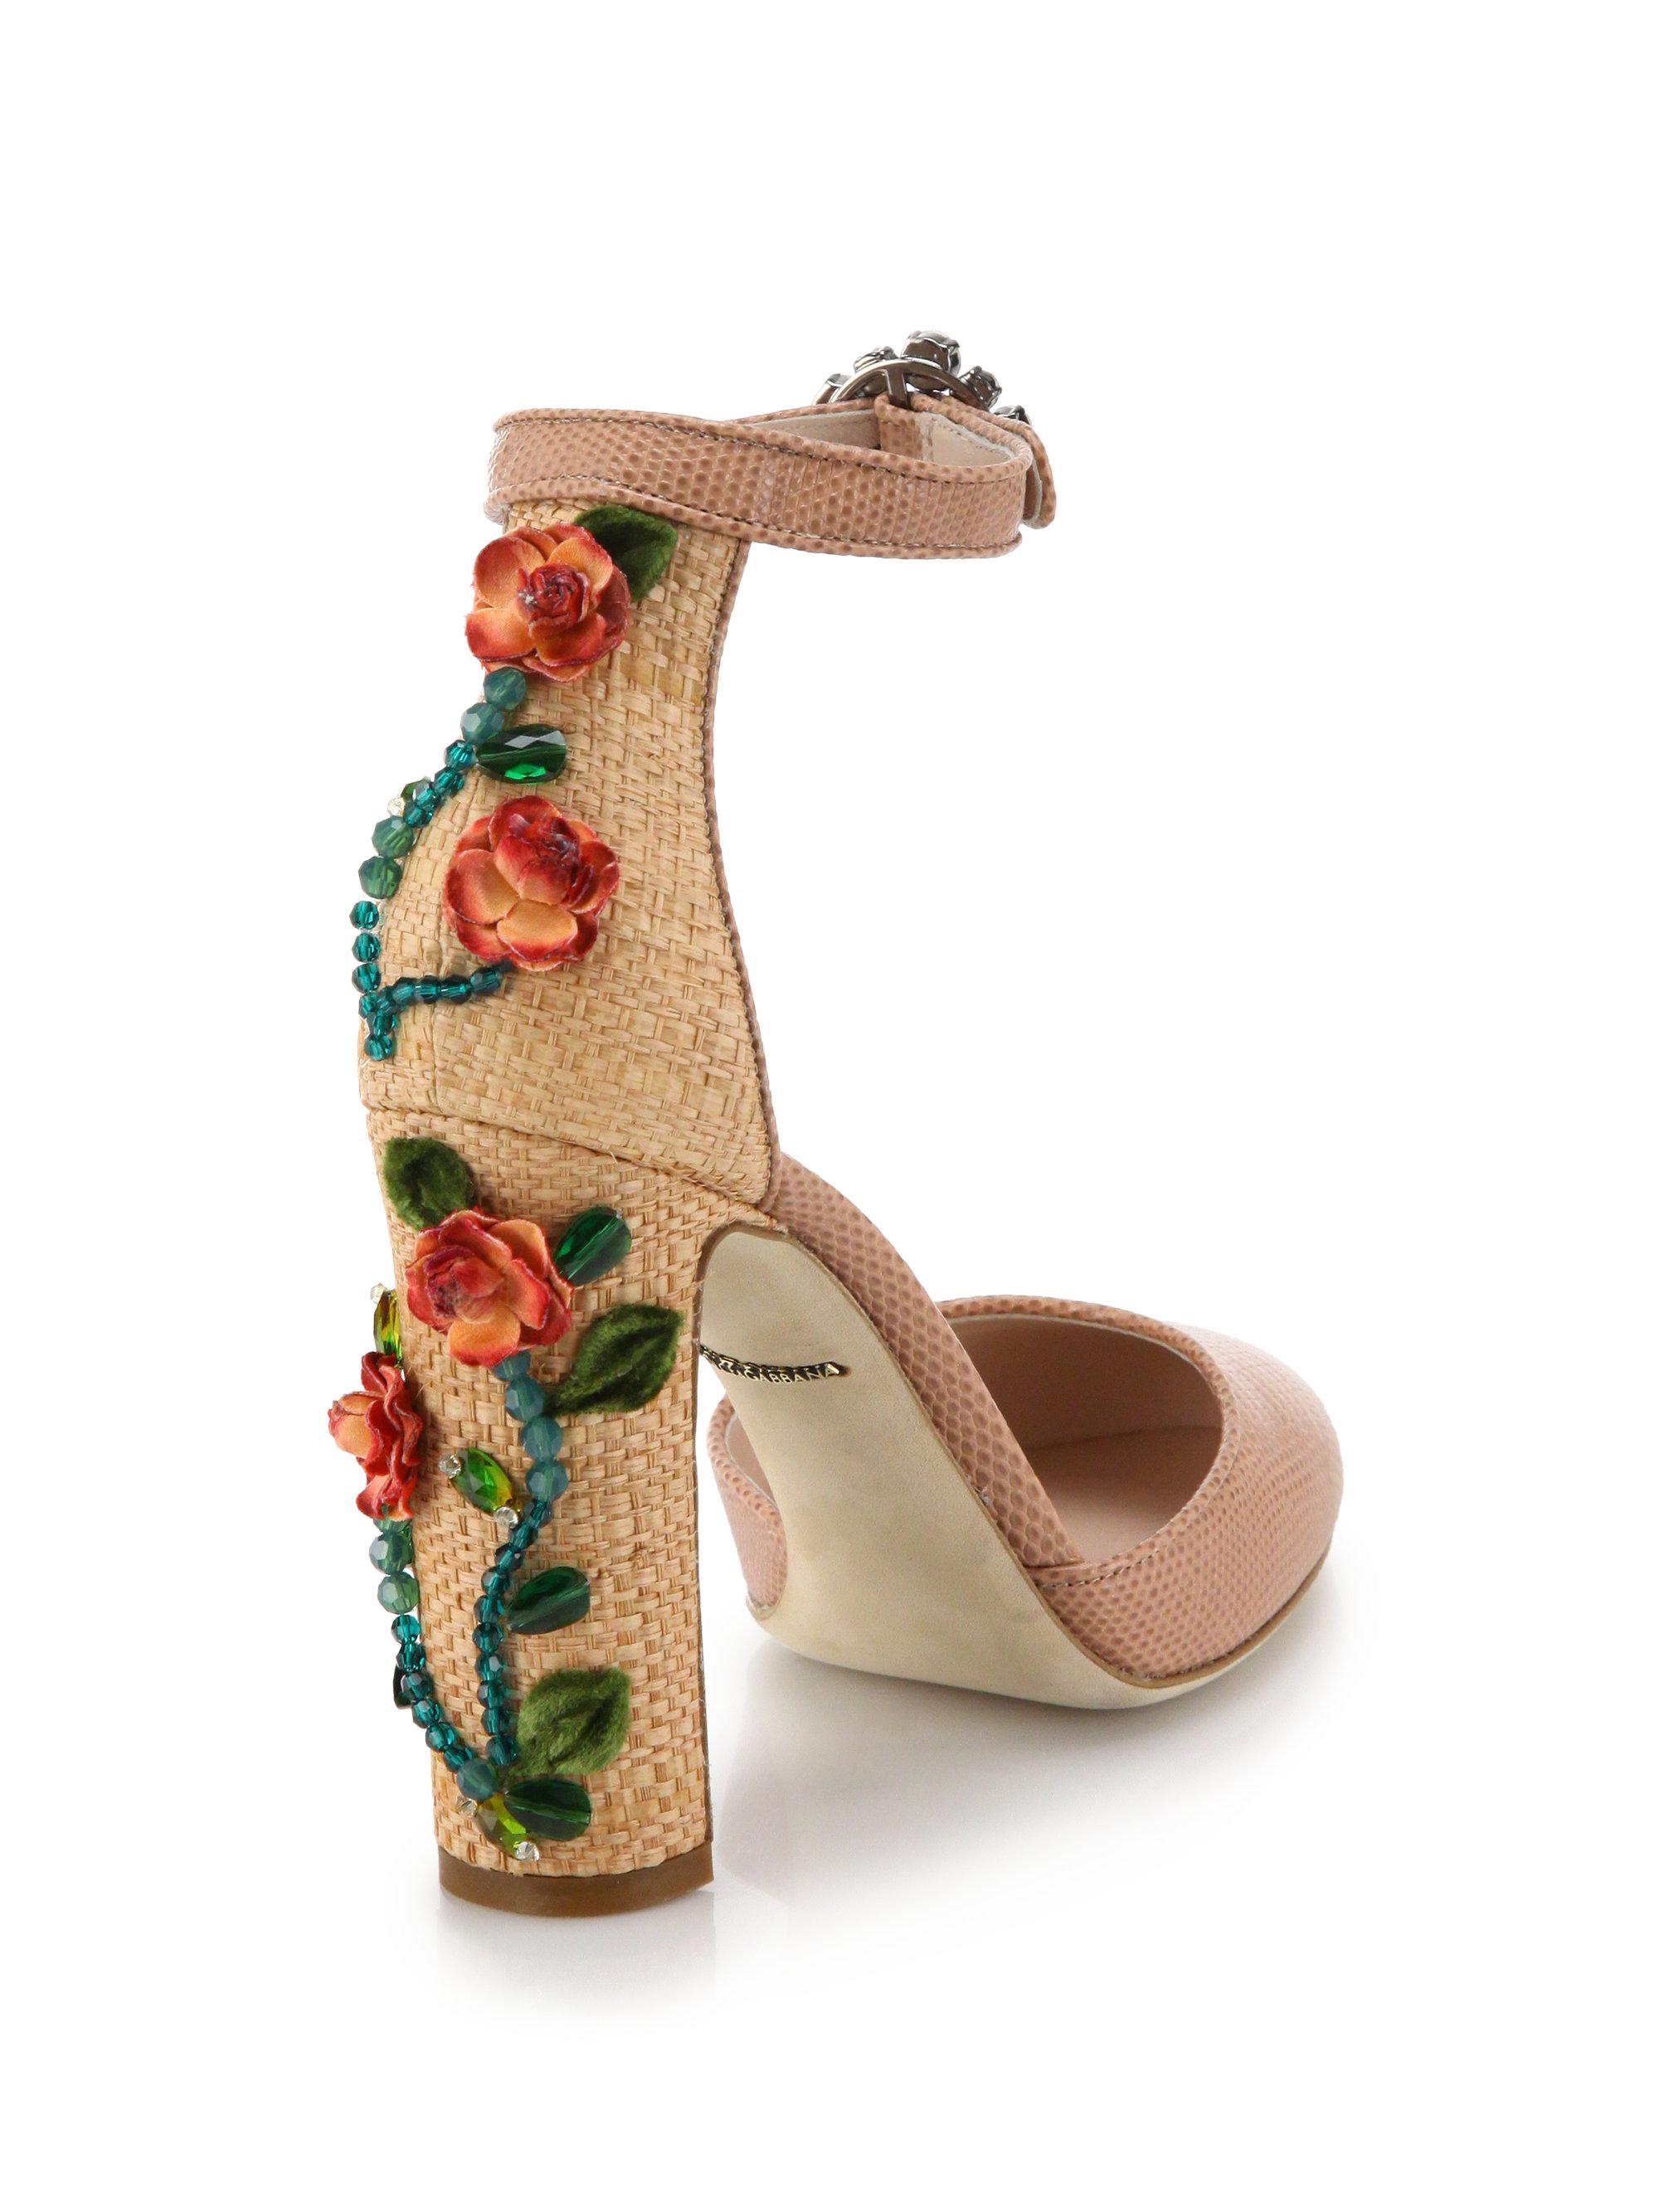 footlocker finishline online with paypal sale online Dolce & Gabbana Leather Embossed Sandals F55L0Ql8B